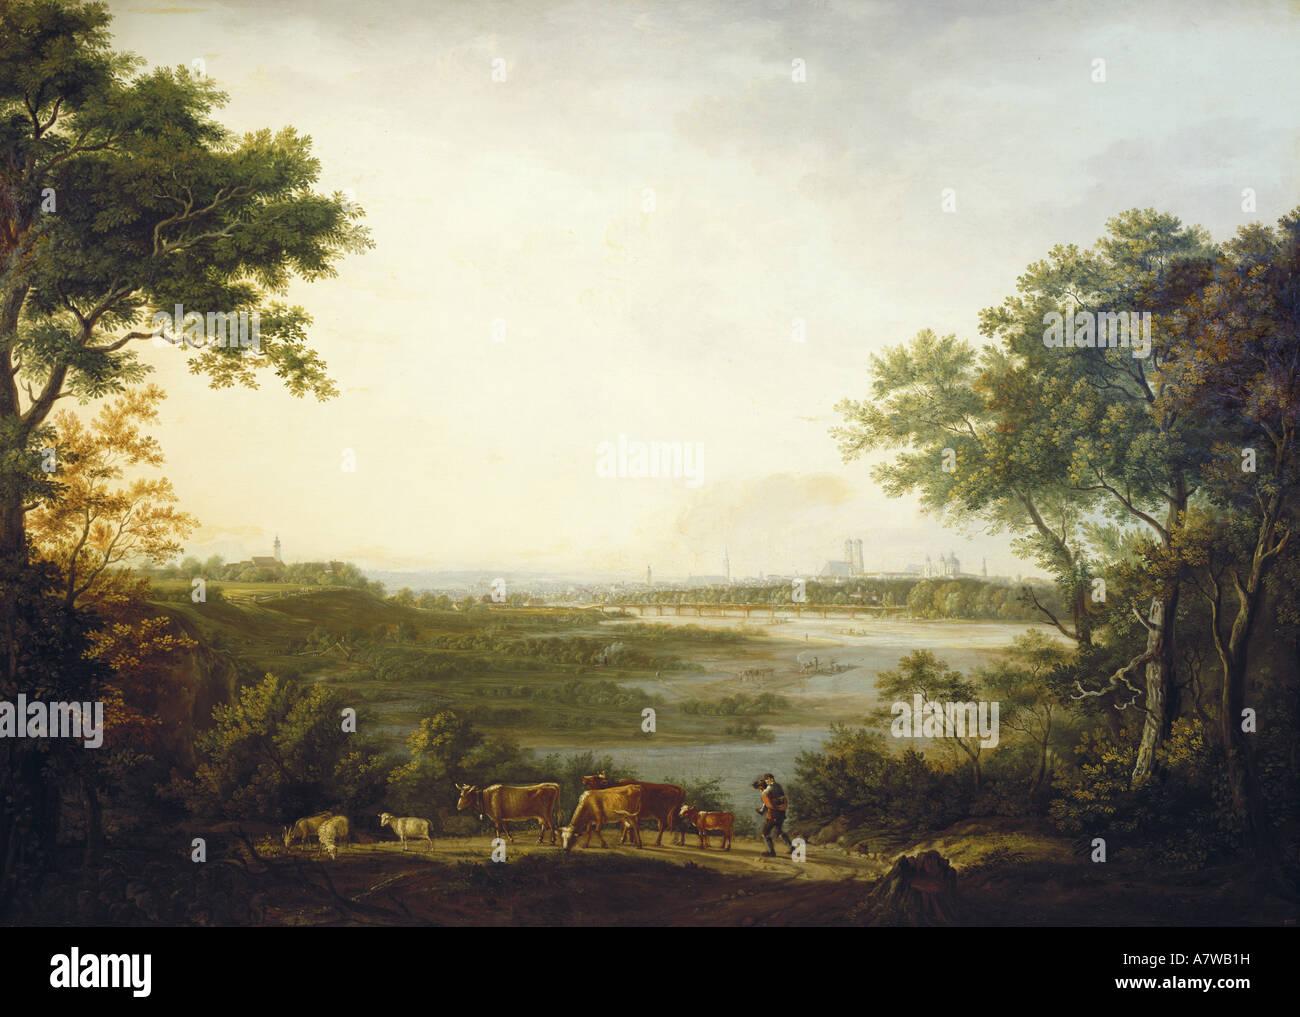 Bellas artes, Dorner, Johann Jakob, el anciano (1766 - 1813), 'Ansicht von München', pintura, 1806, óleo sobre lienzo, Foto de stock